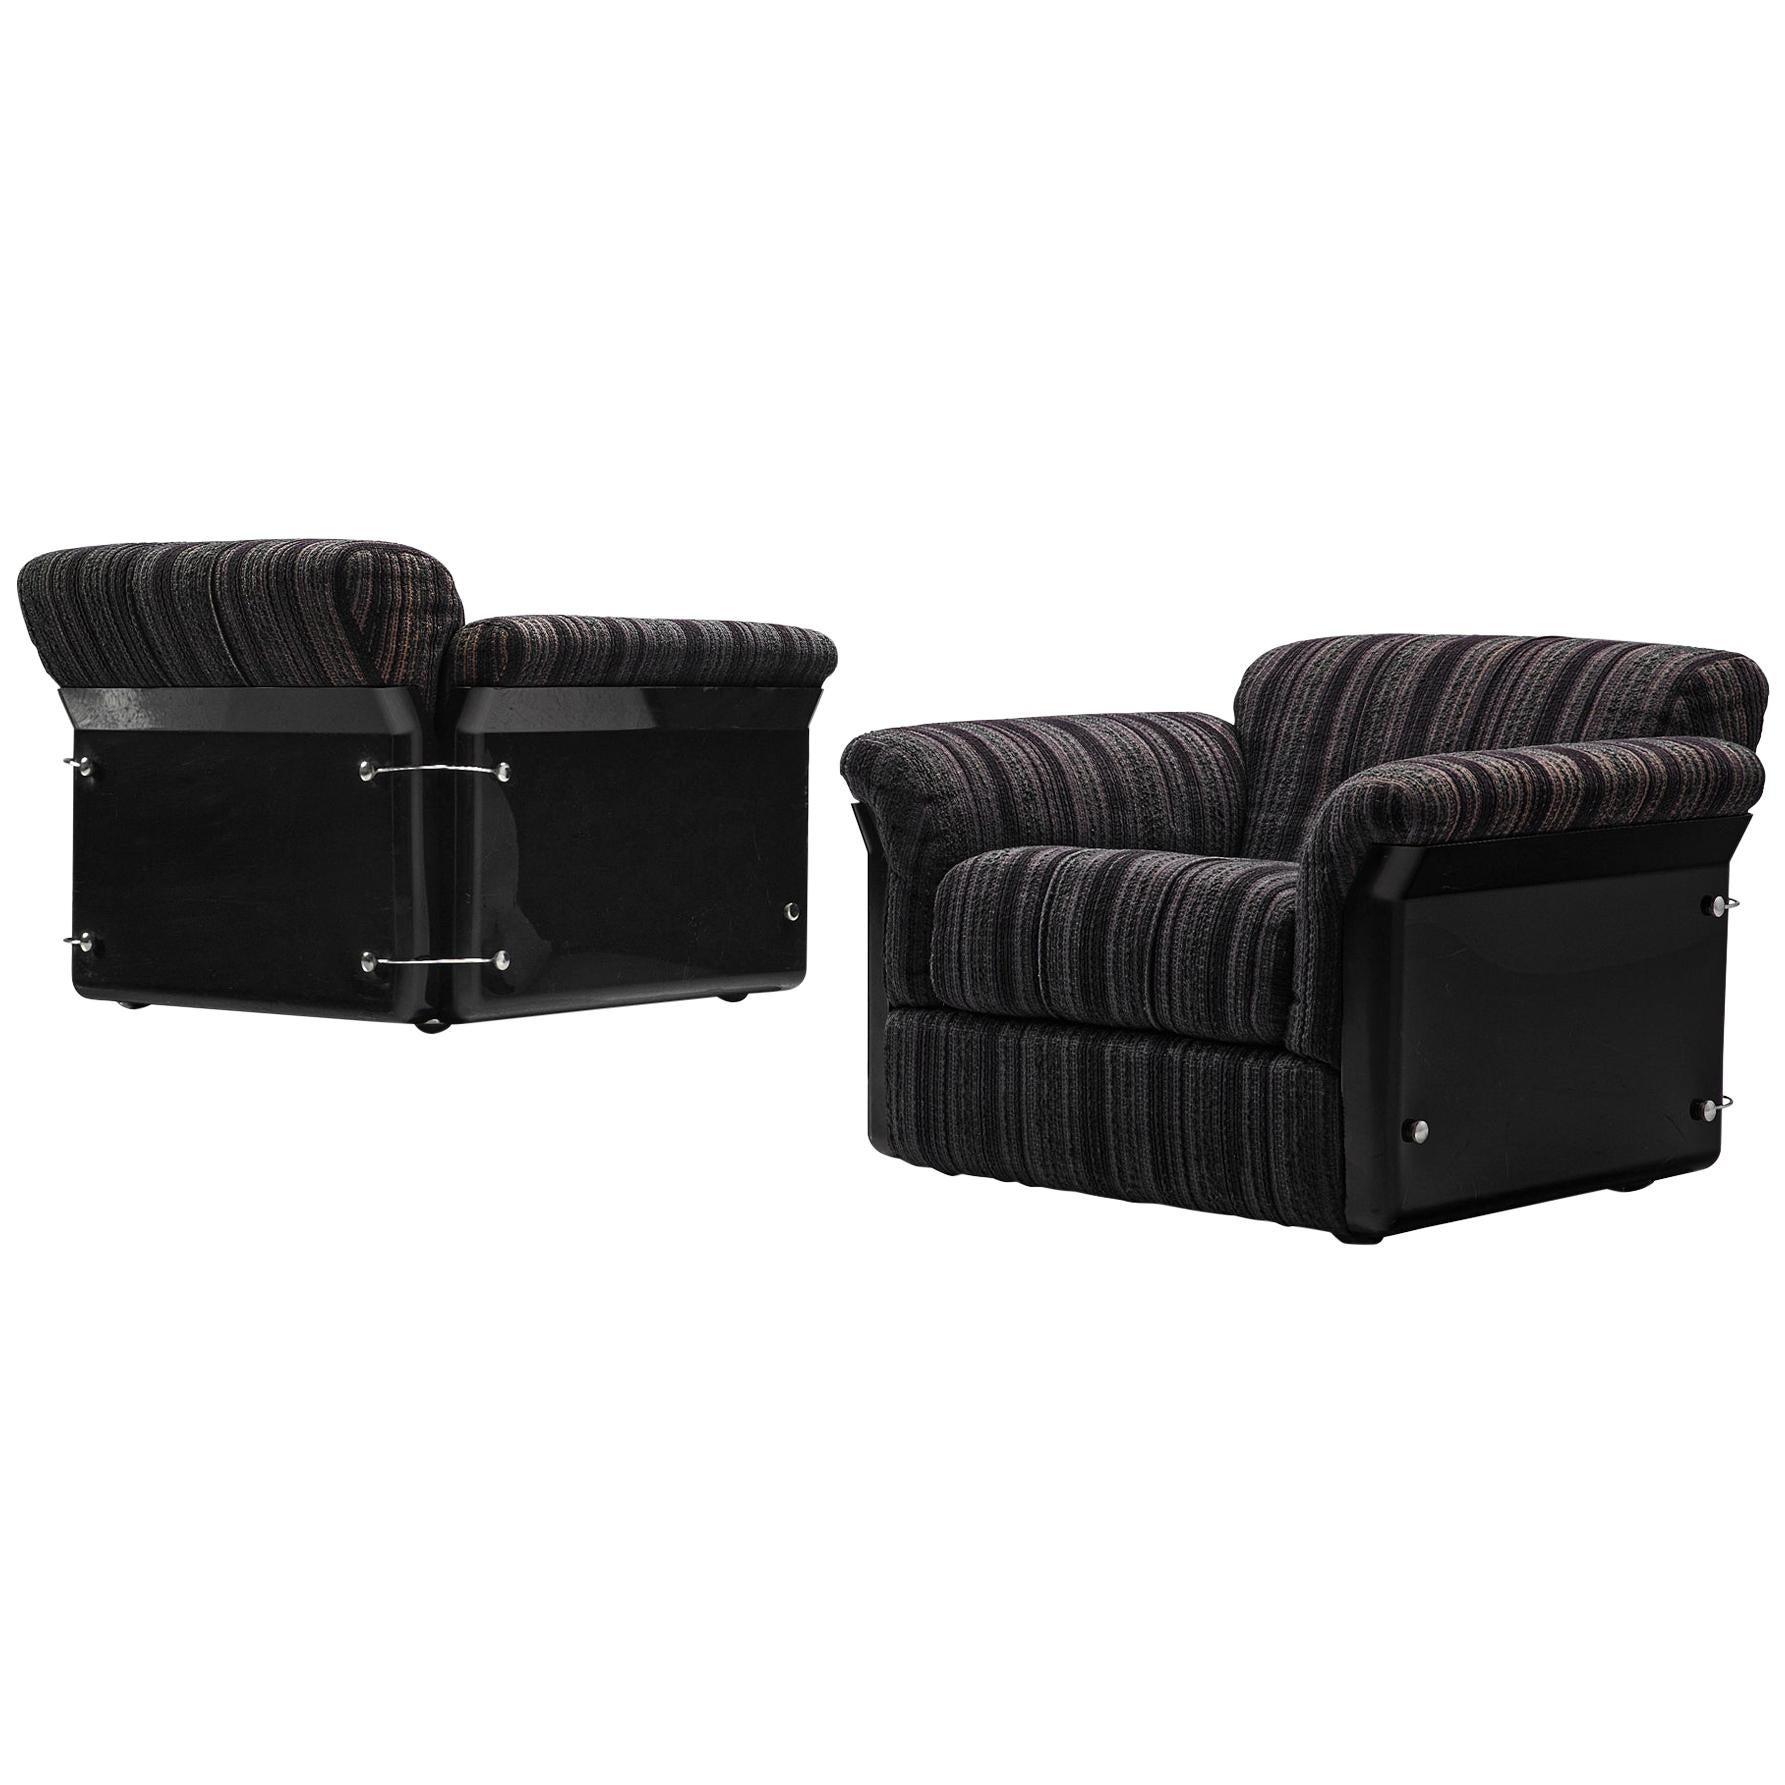 Vittorio Introini for Saporiti Pair of 'Larissa' Lounge Chairs